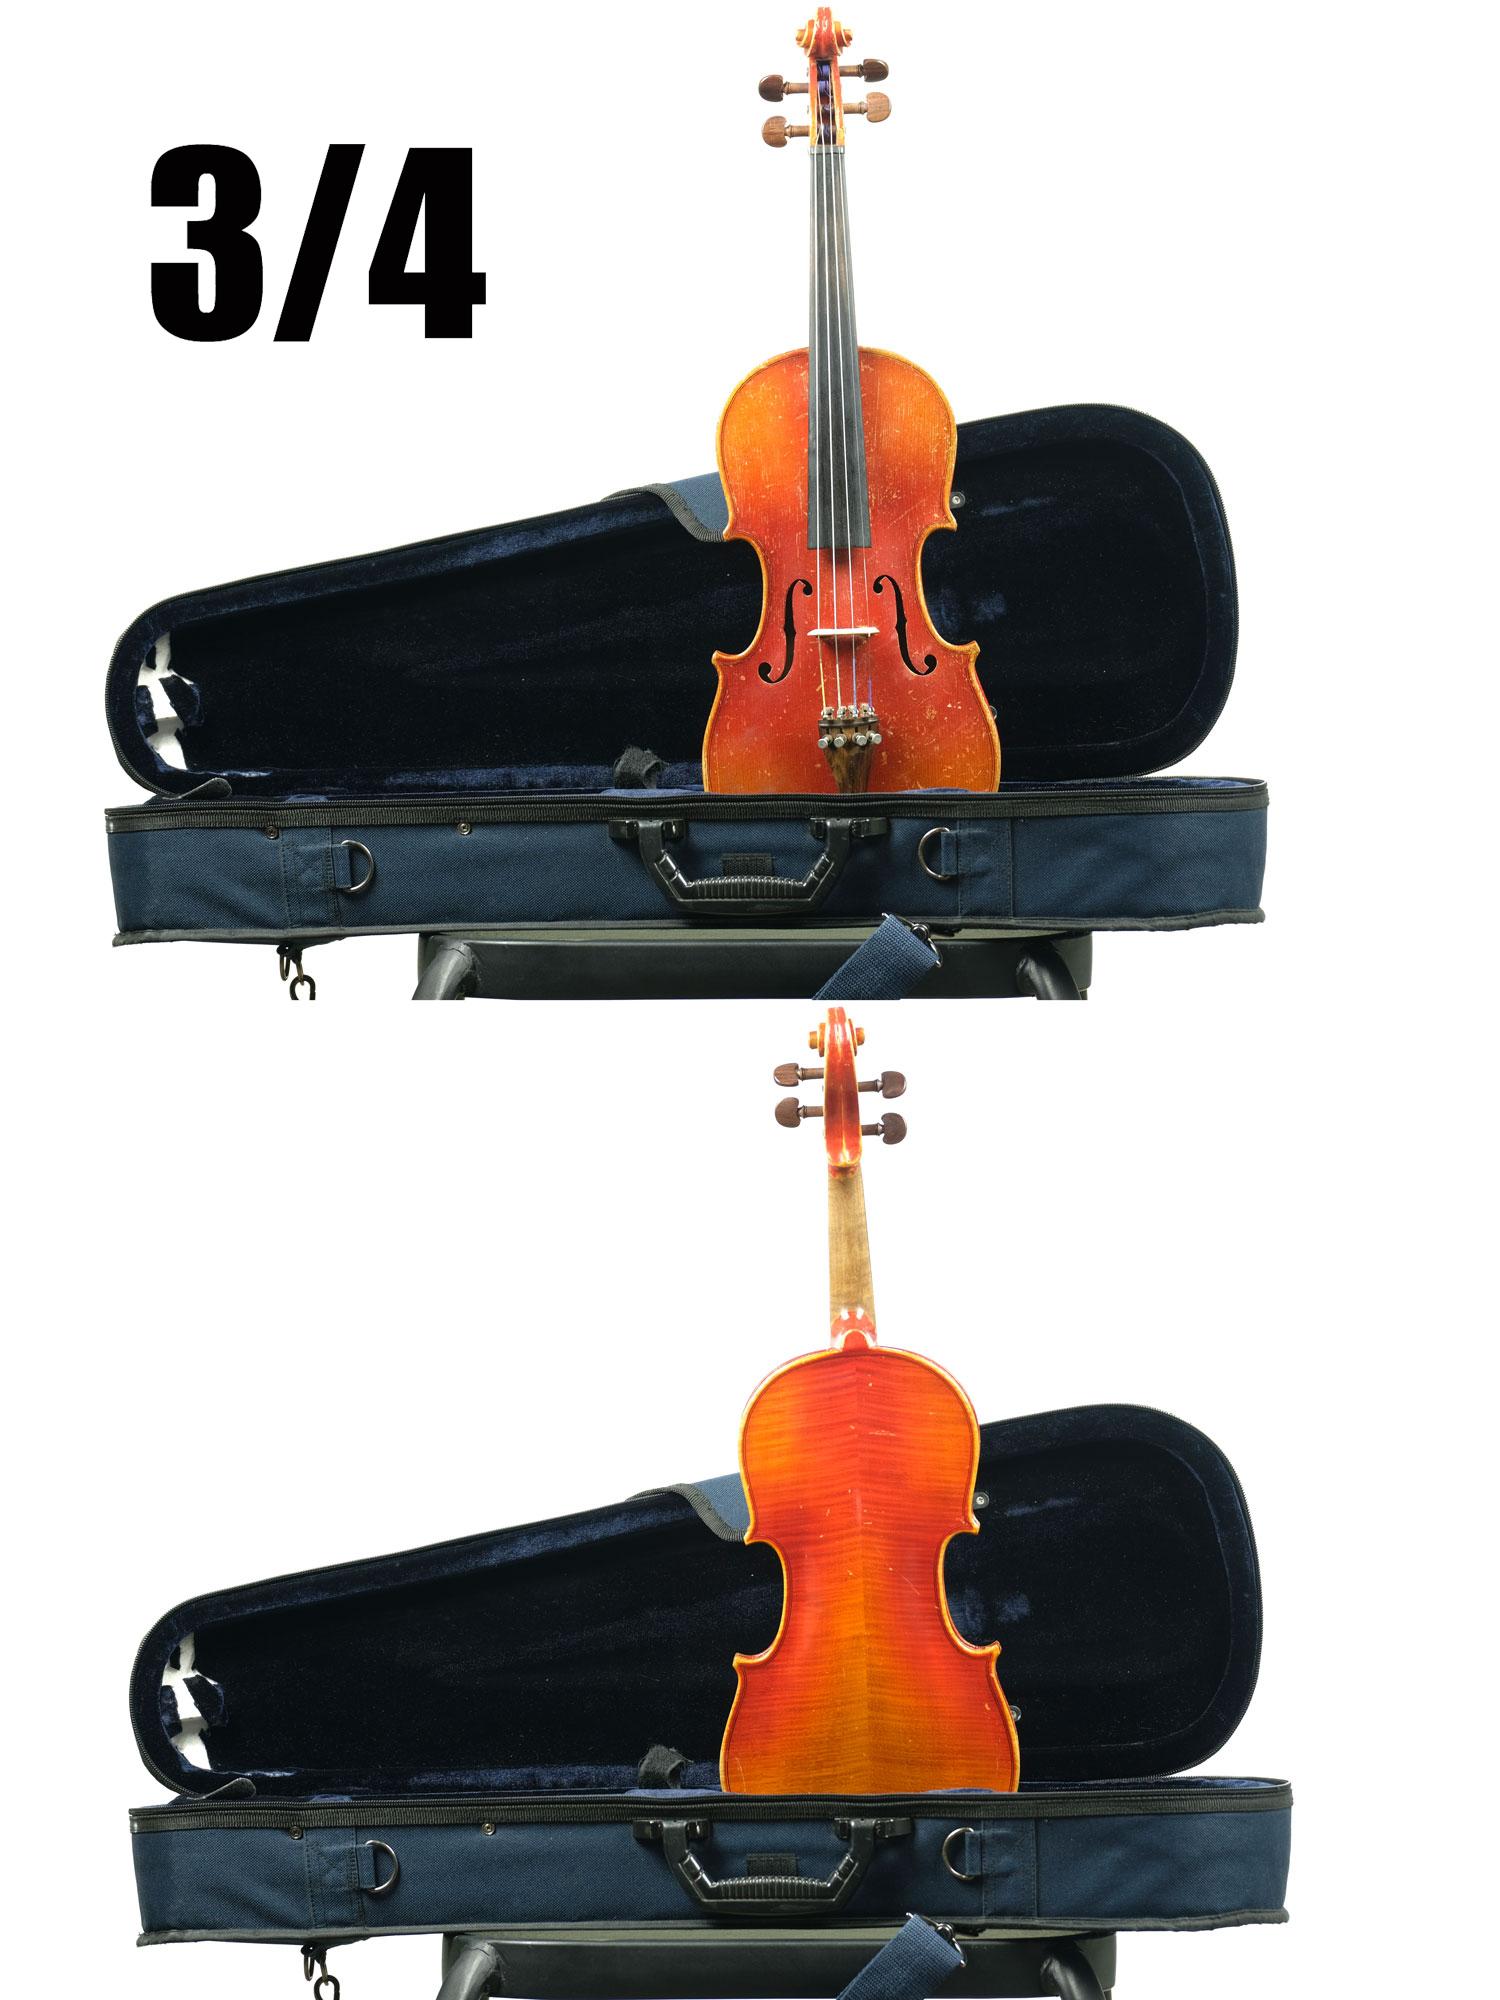 ¾ size violin Copy of Nicholaus Amatus